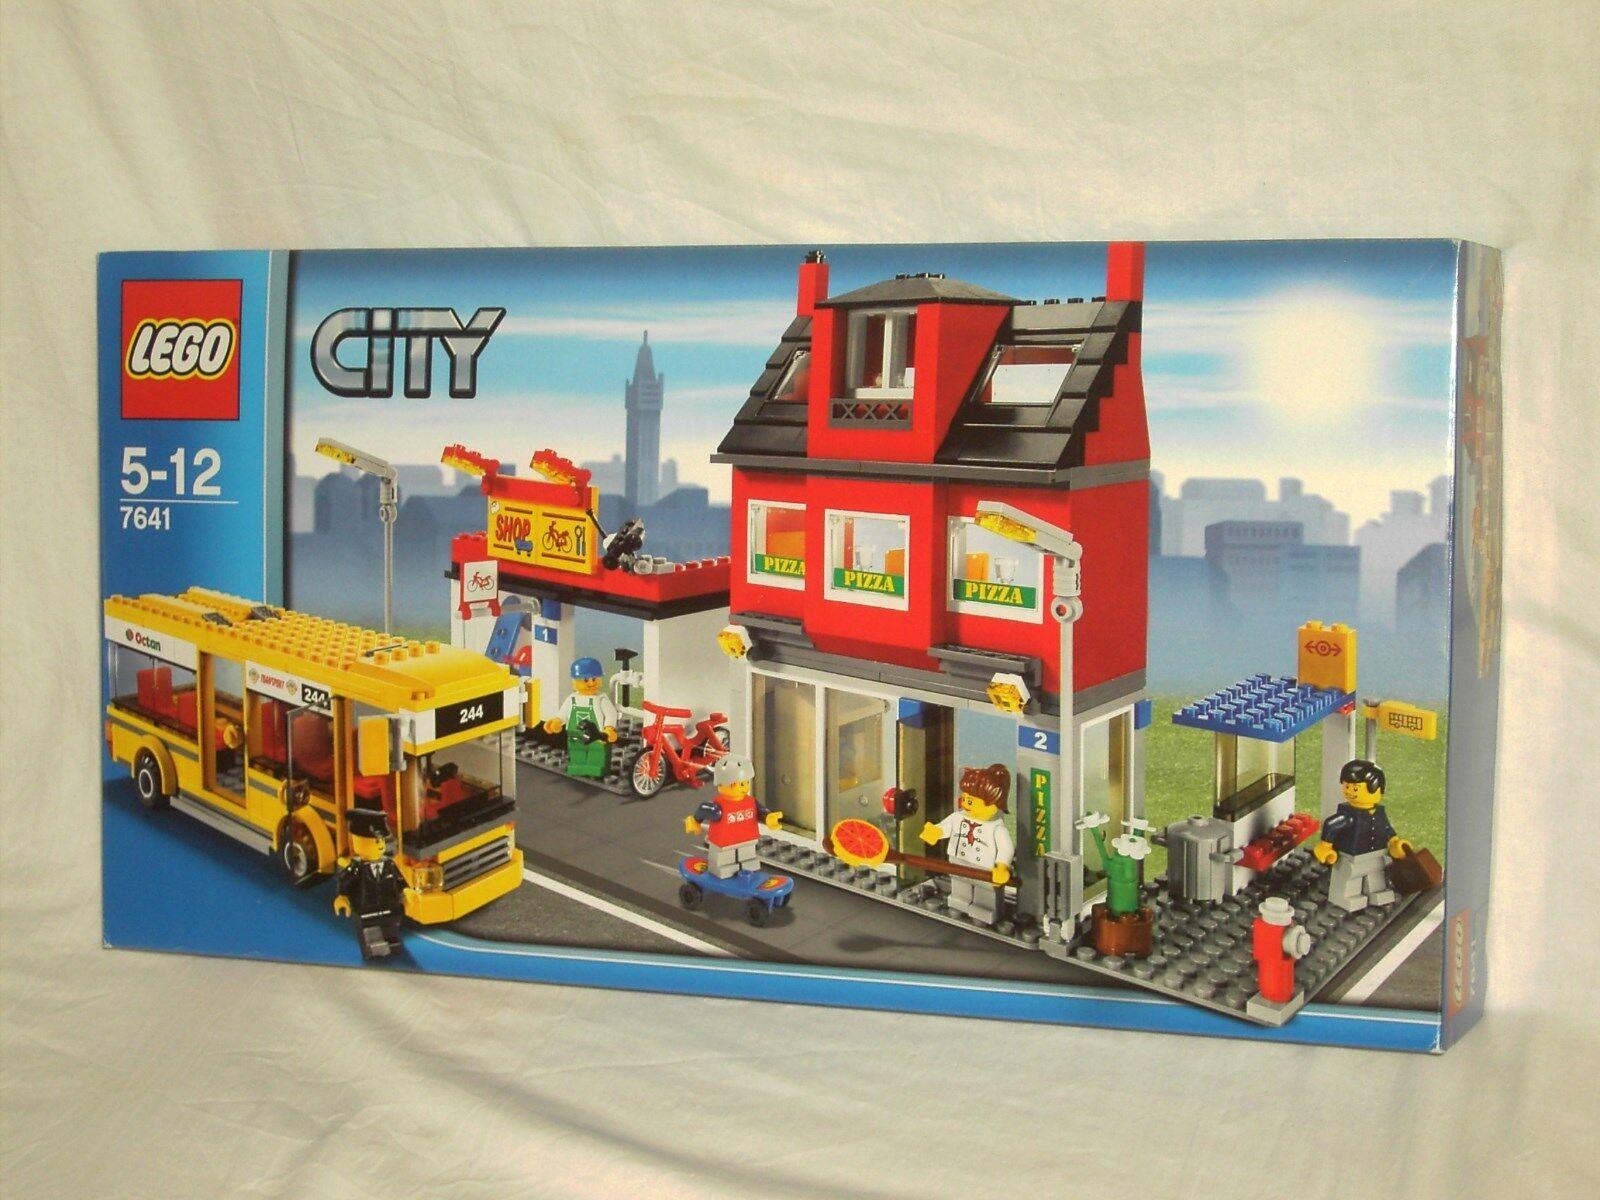 LEGO CITY  7641 - CITY CORNER         NEW AND SEALED